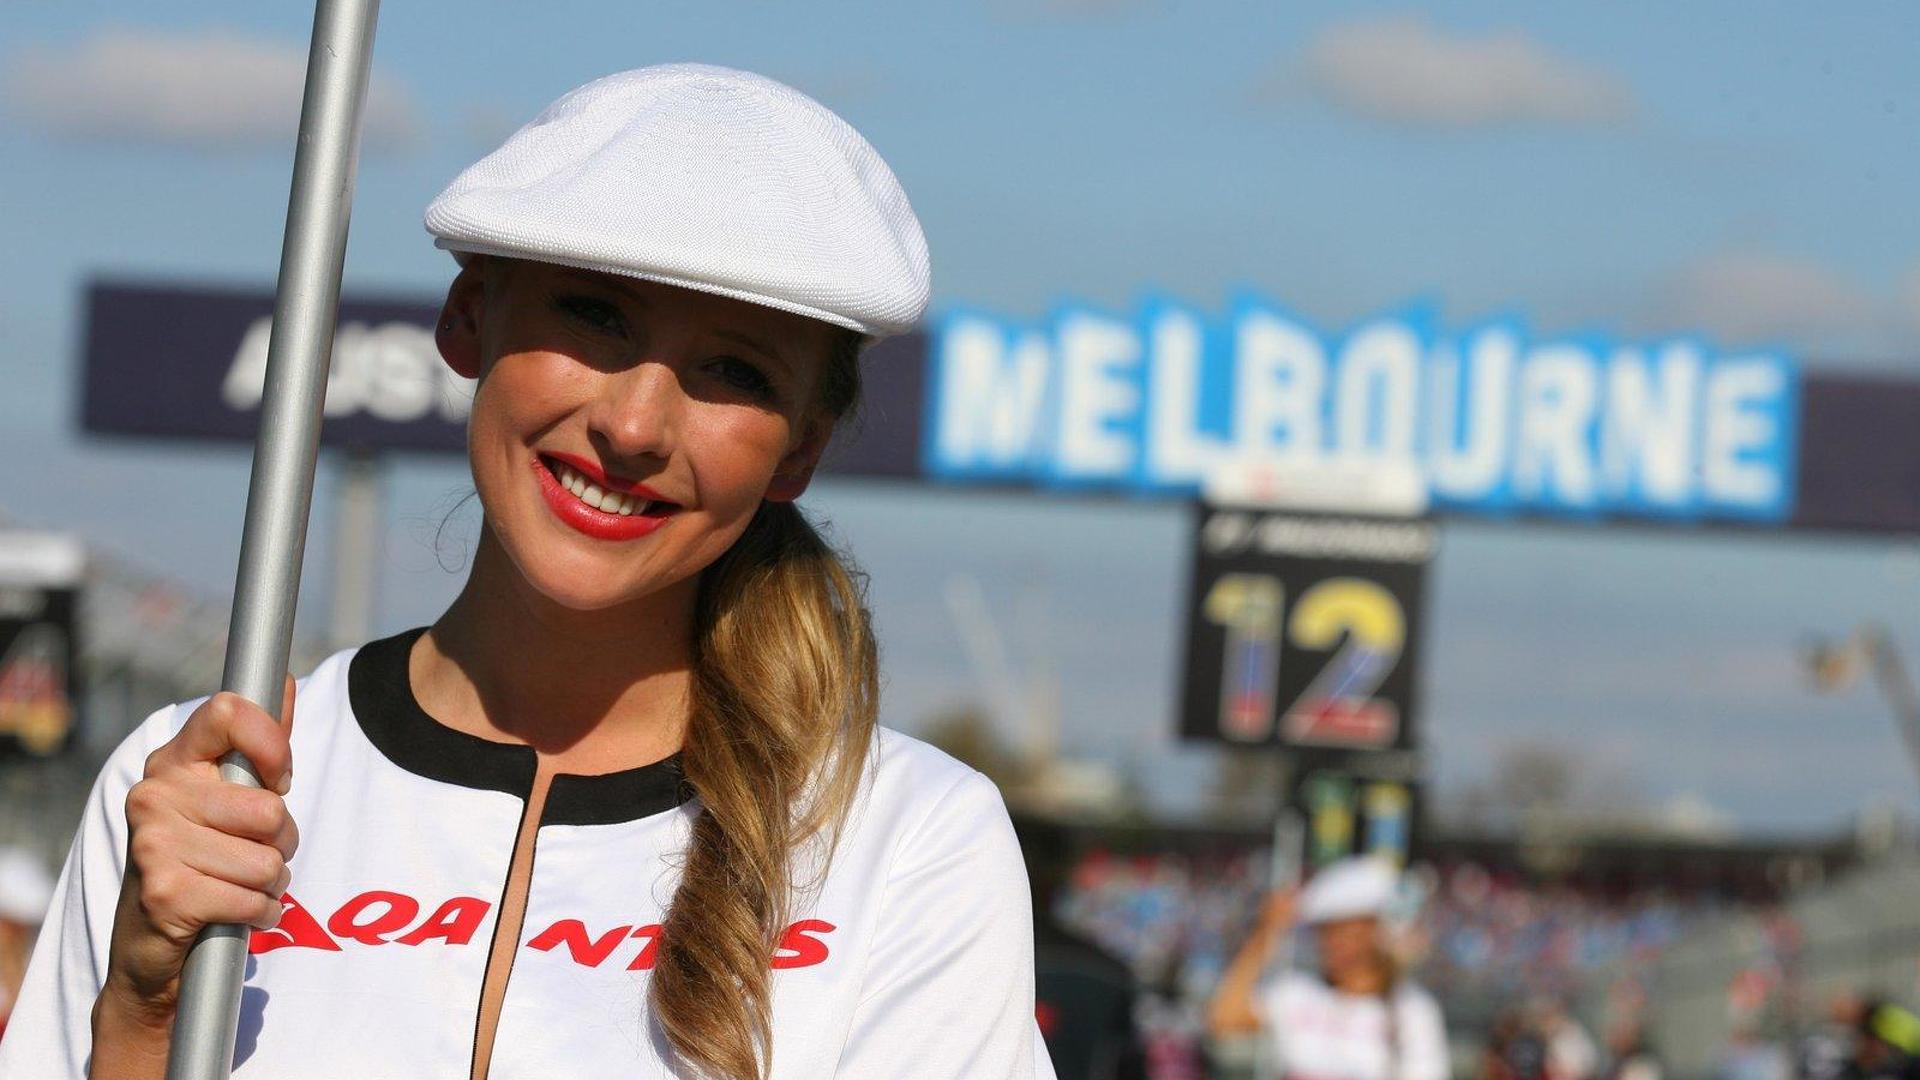 Melbourne boss Walker in talks for new F1 deal